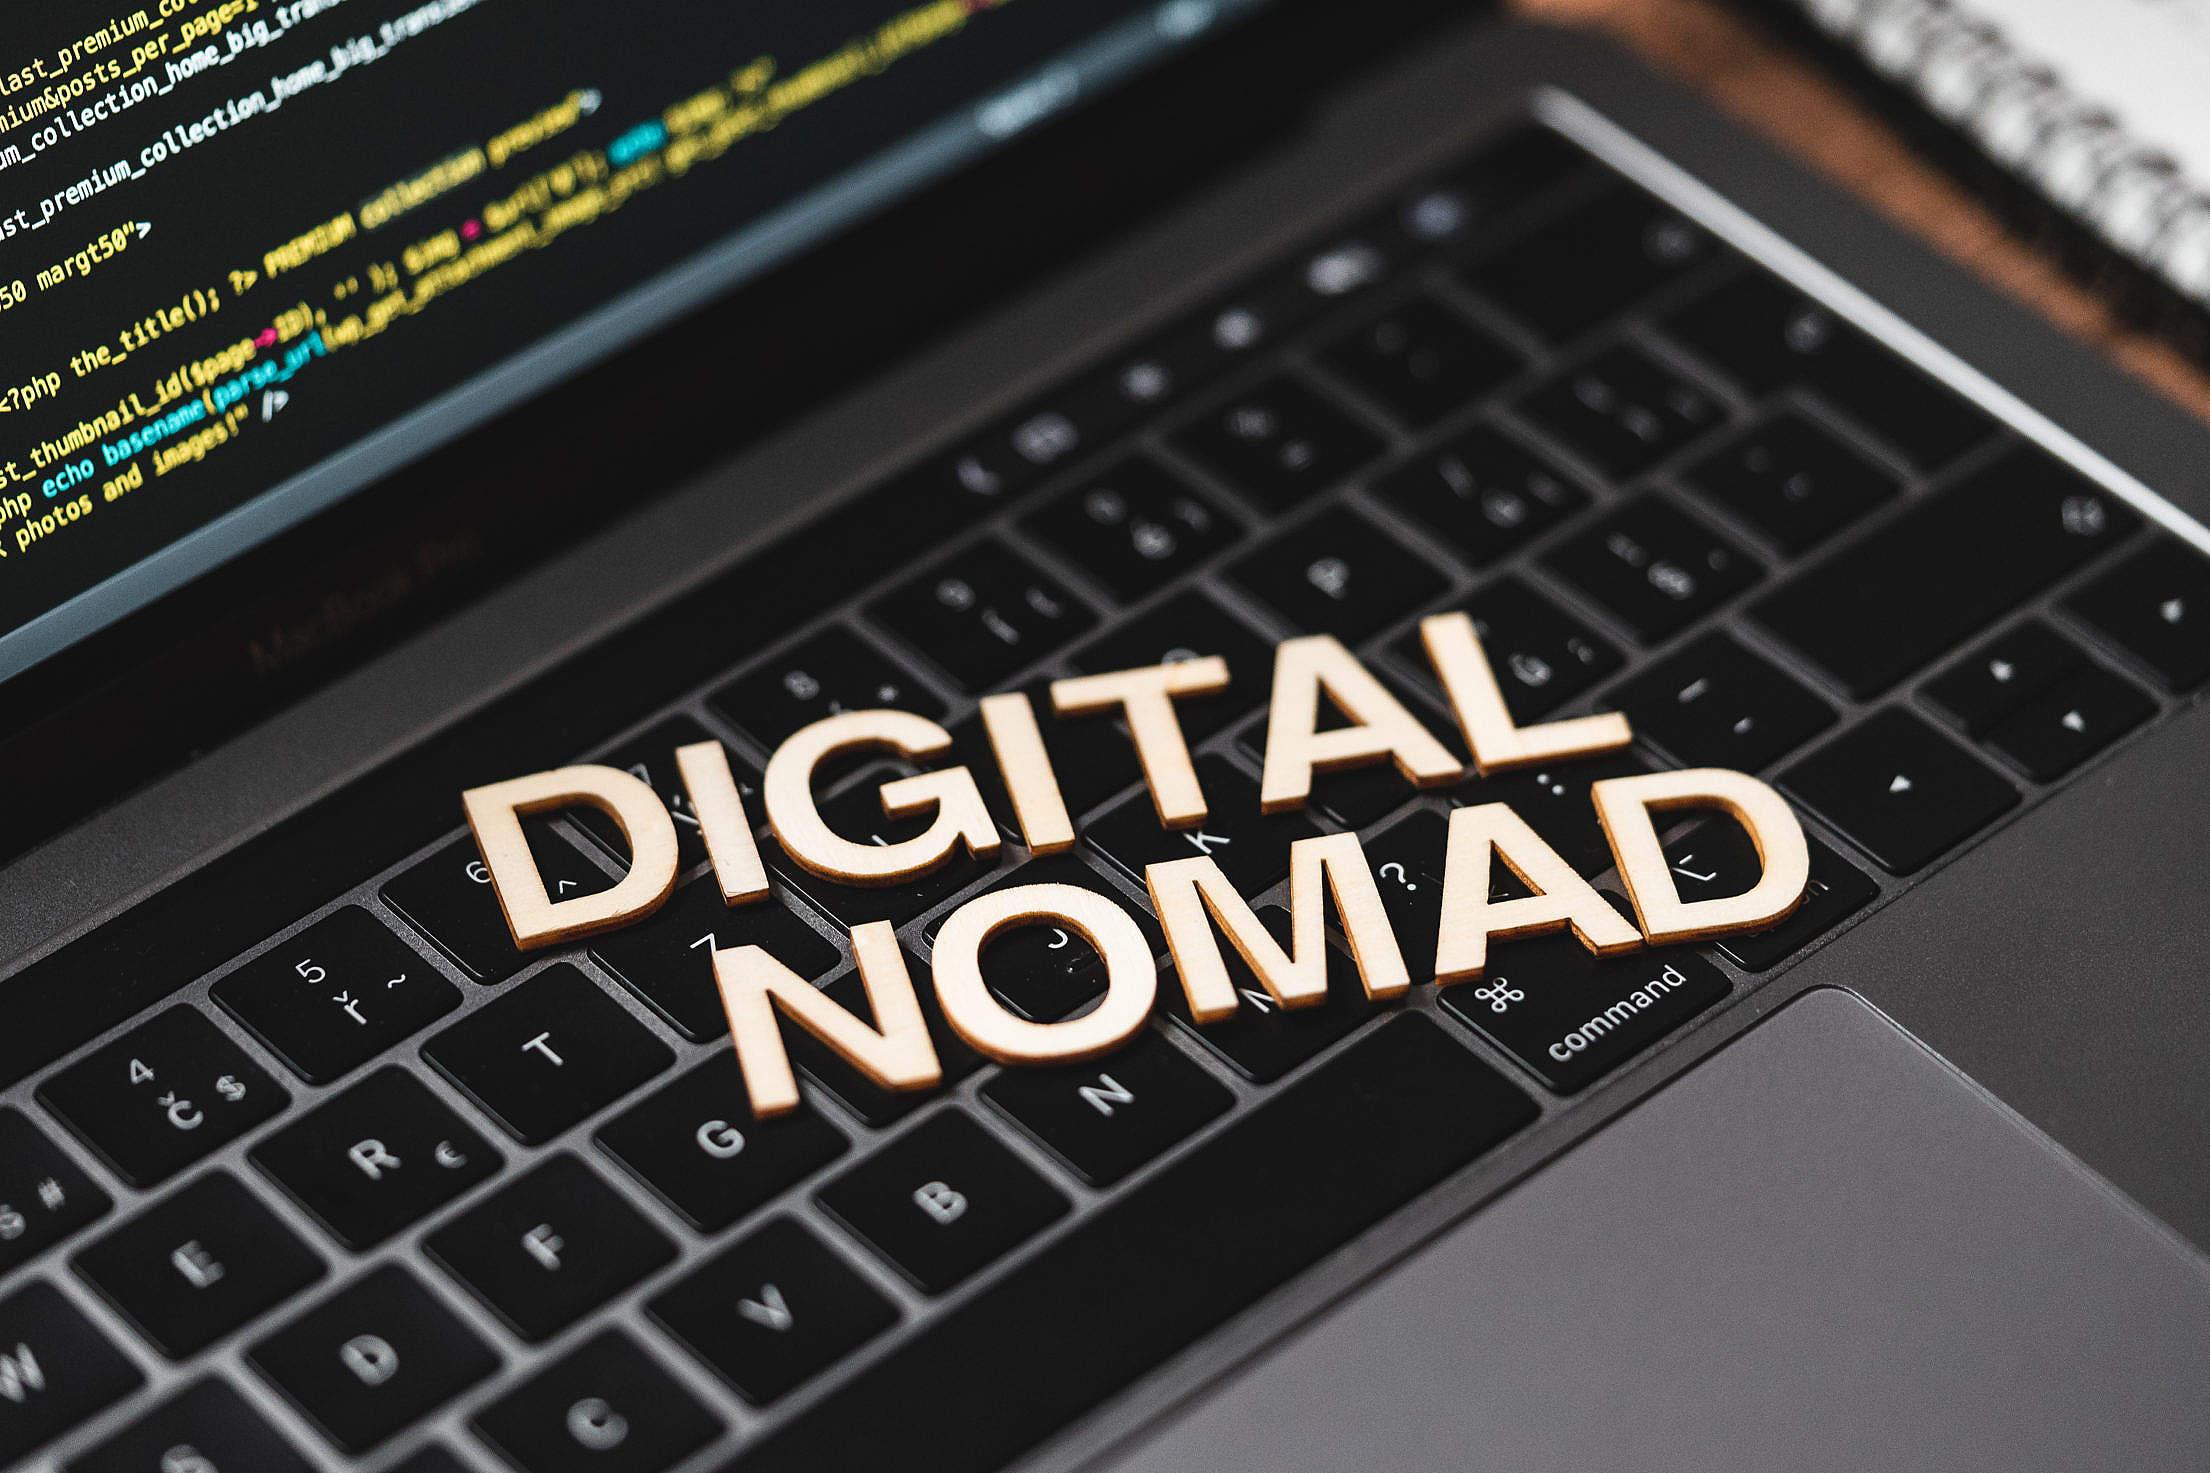 Digital Nomad Free Stock Photo